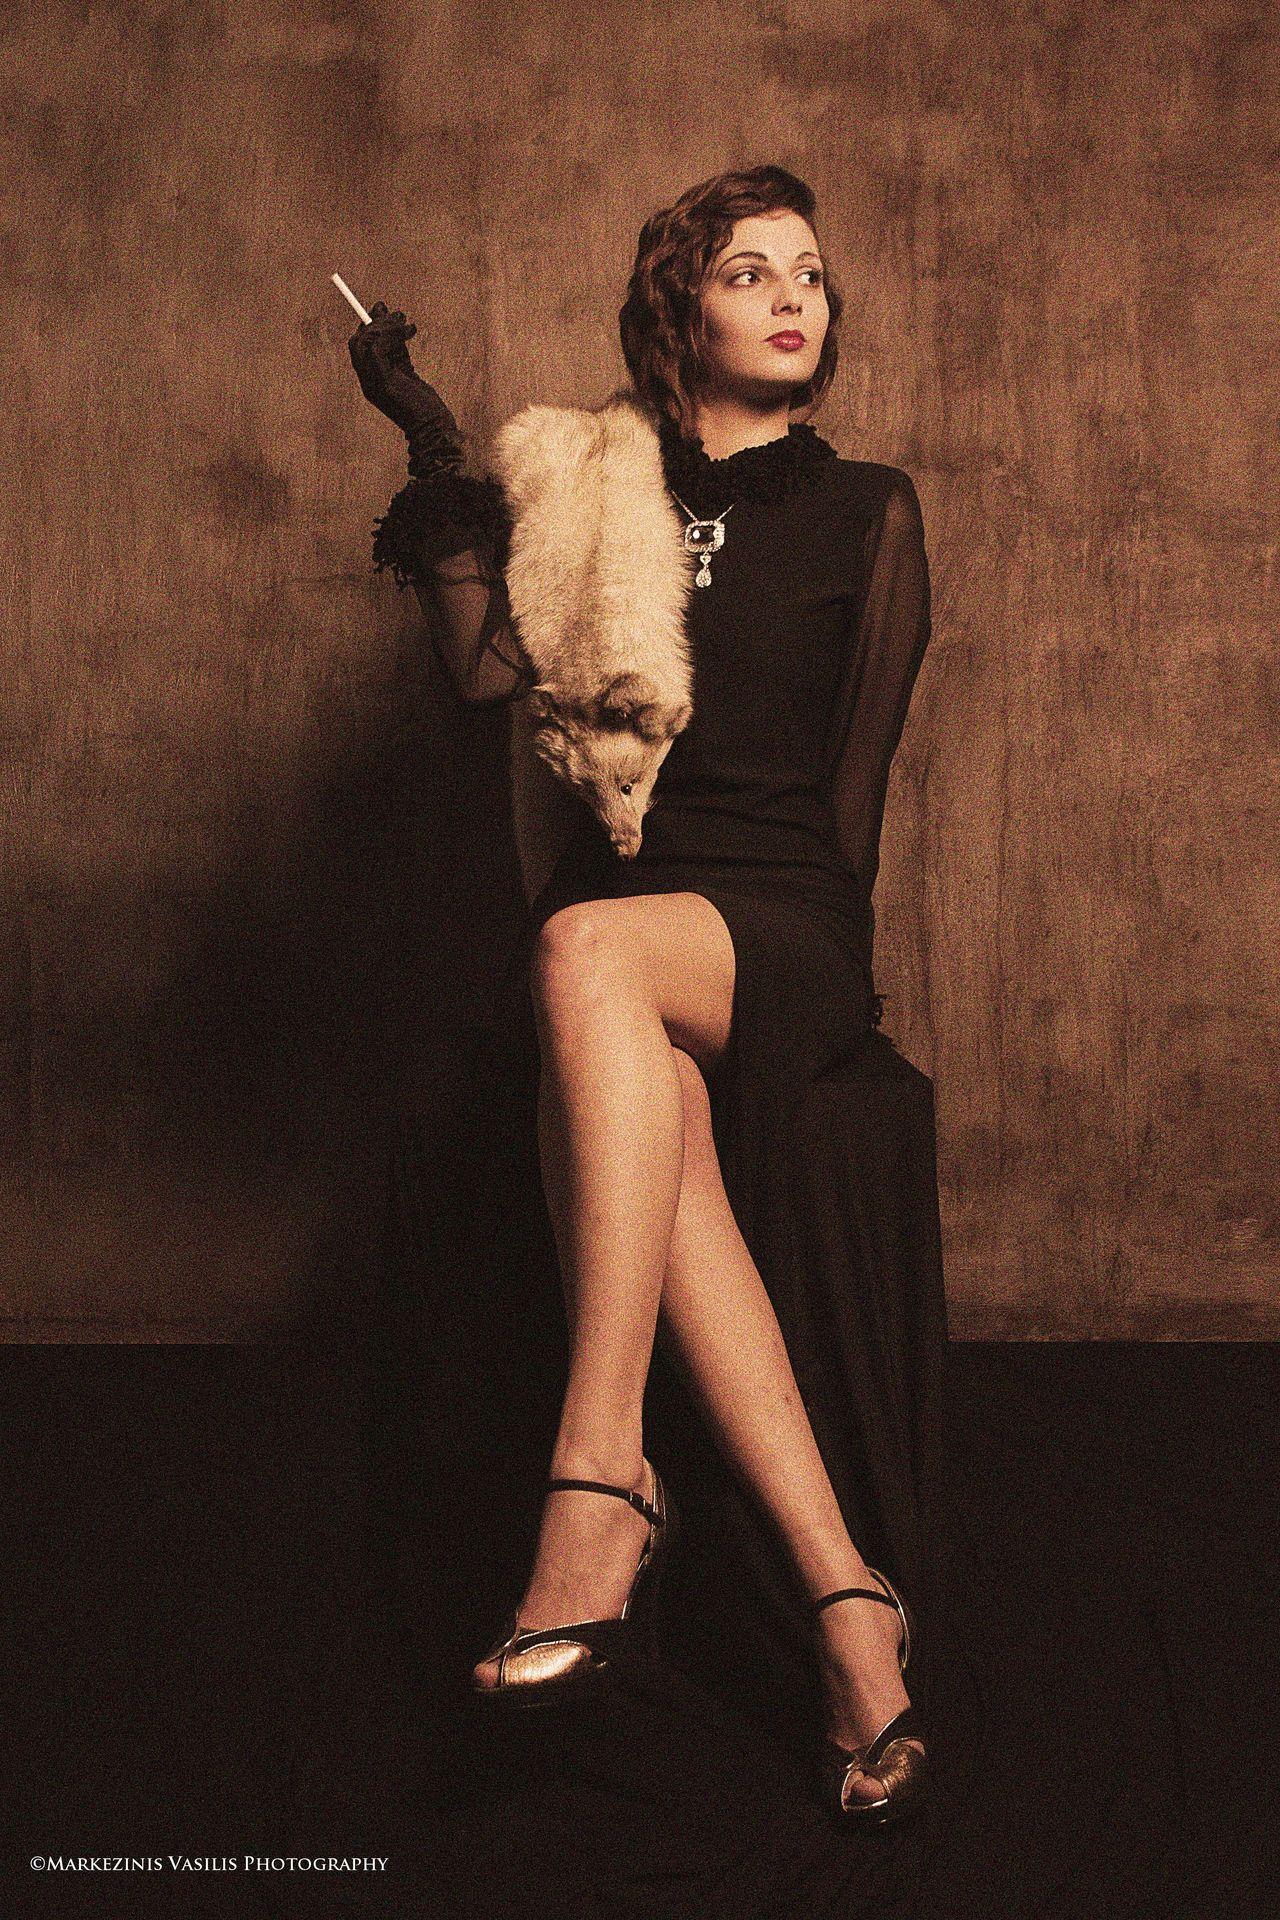 Cigarette  Fashion Fashion Lifestyle Lifestyles Luxury Mvphotography Portrait Women Young Women